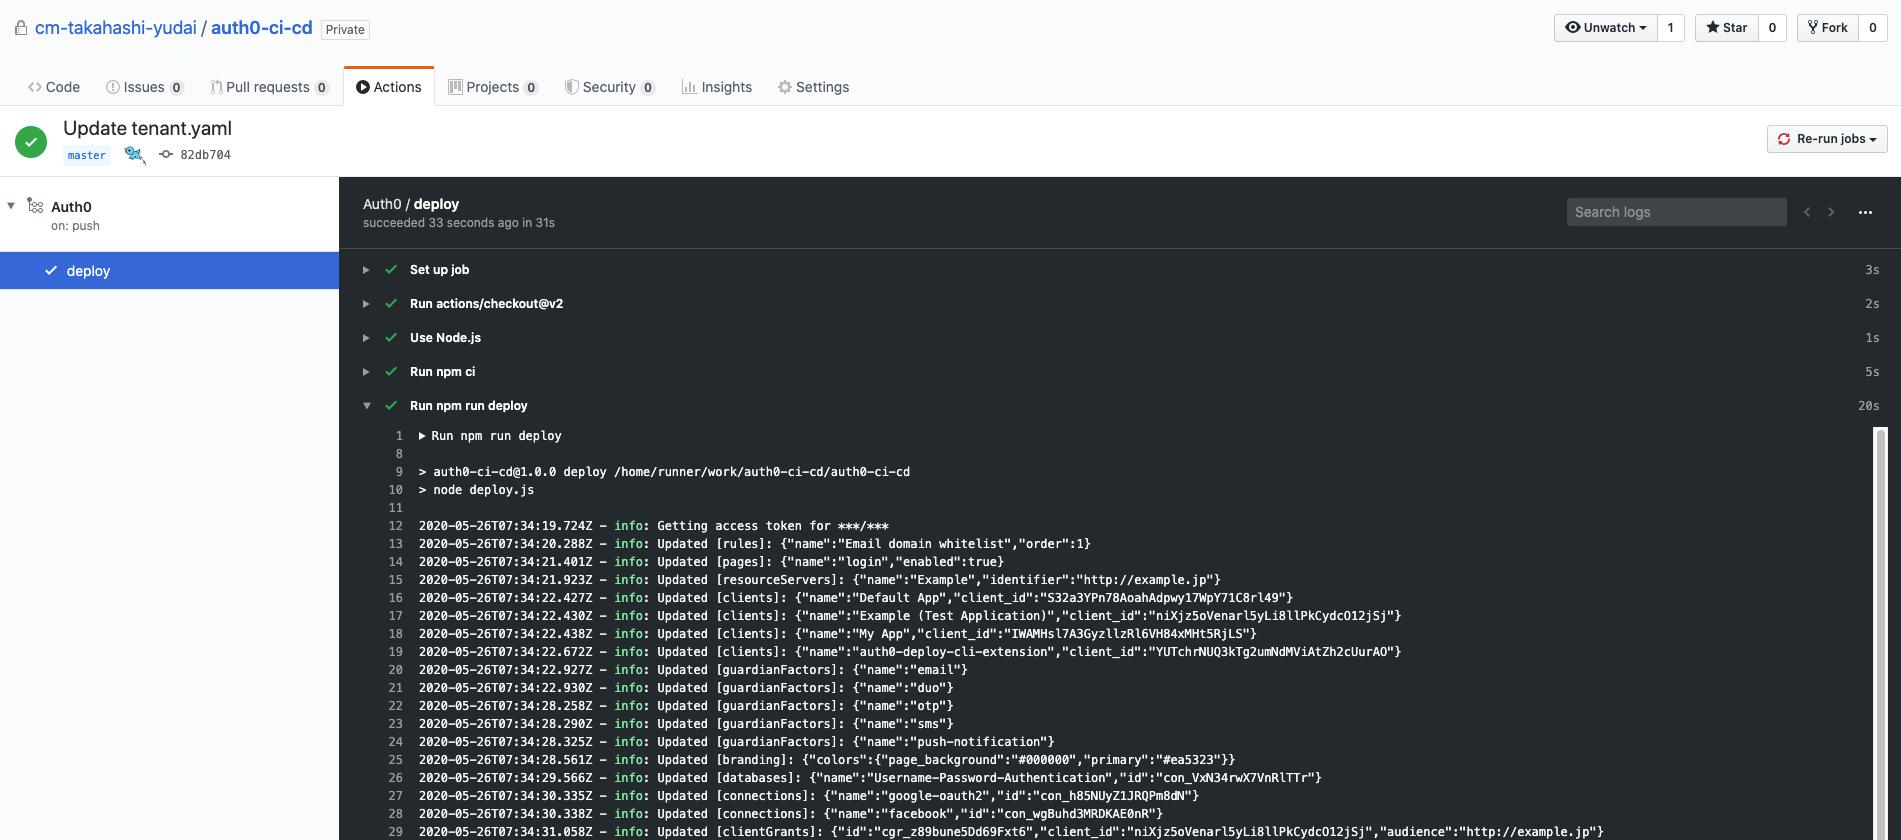 GitHub Actionsワークフロー実行